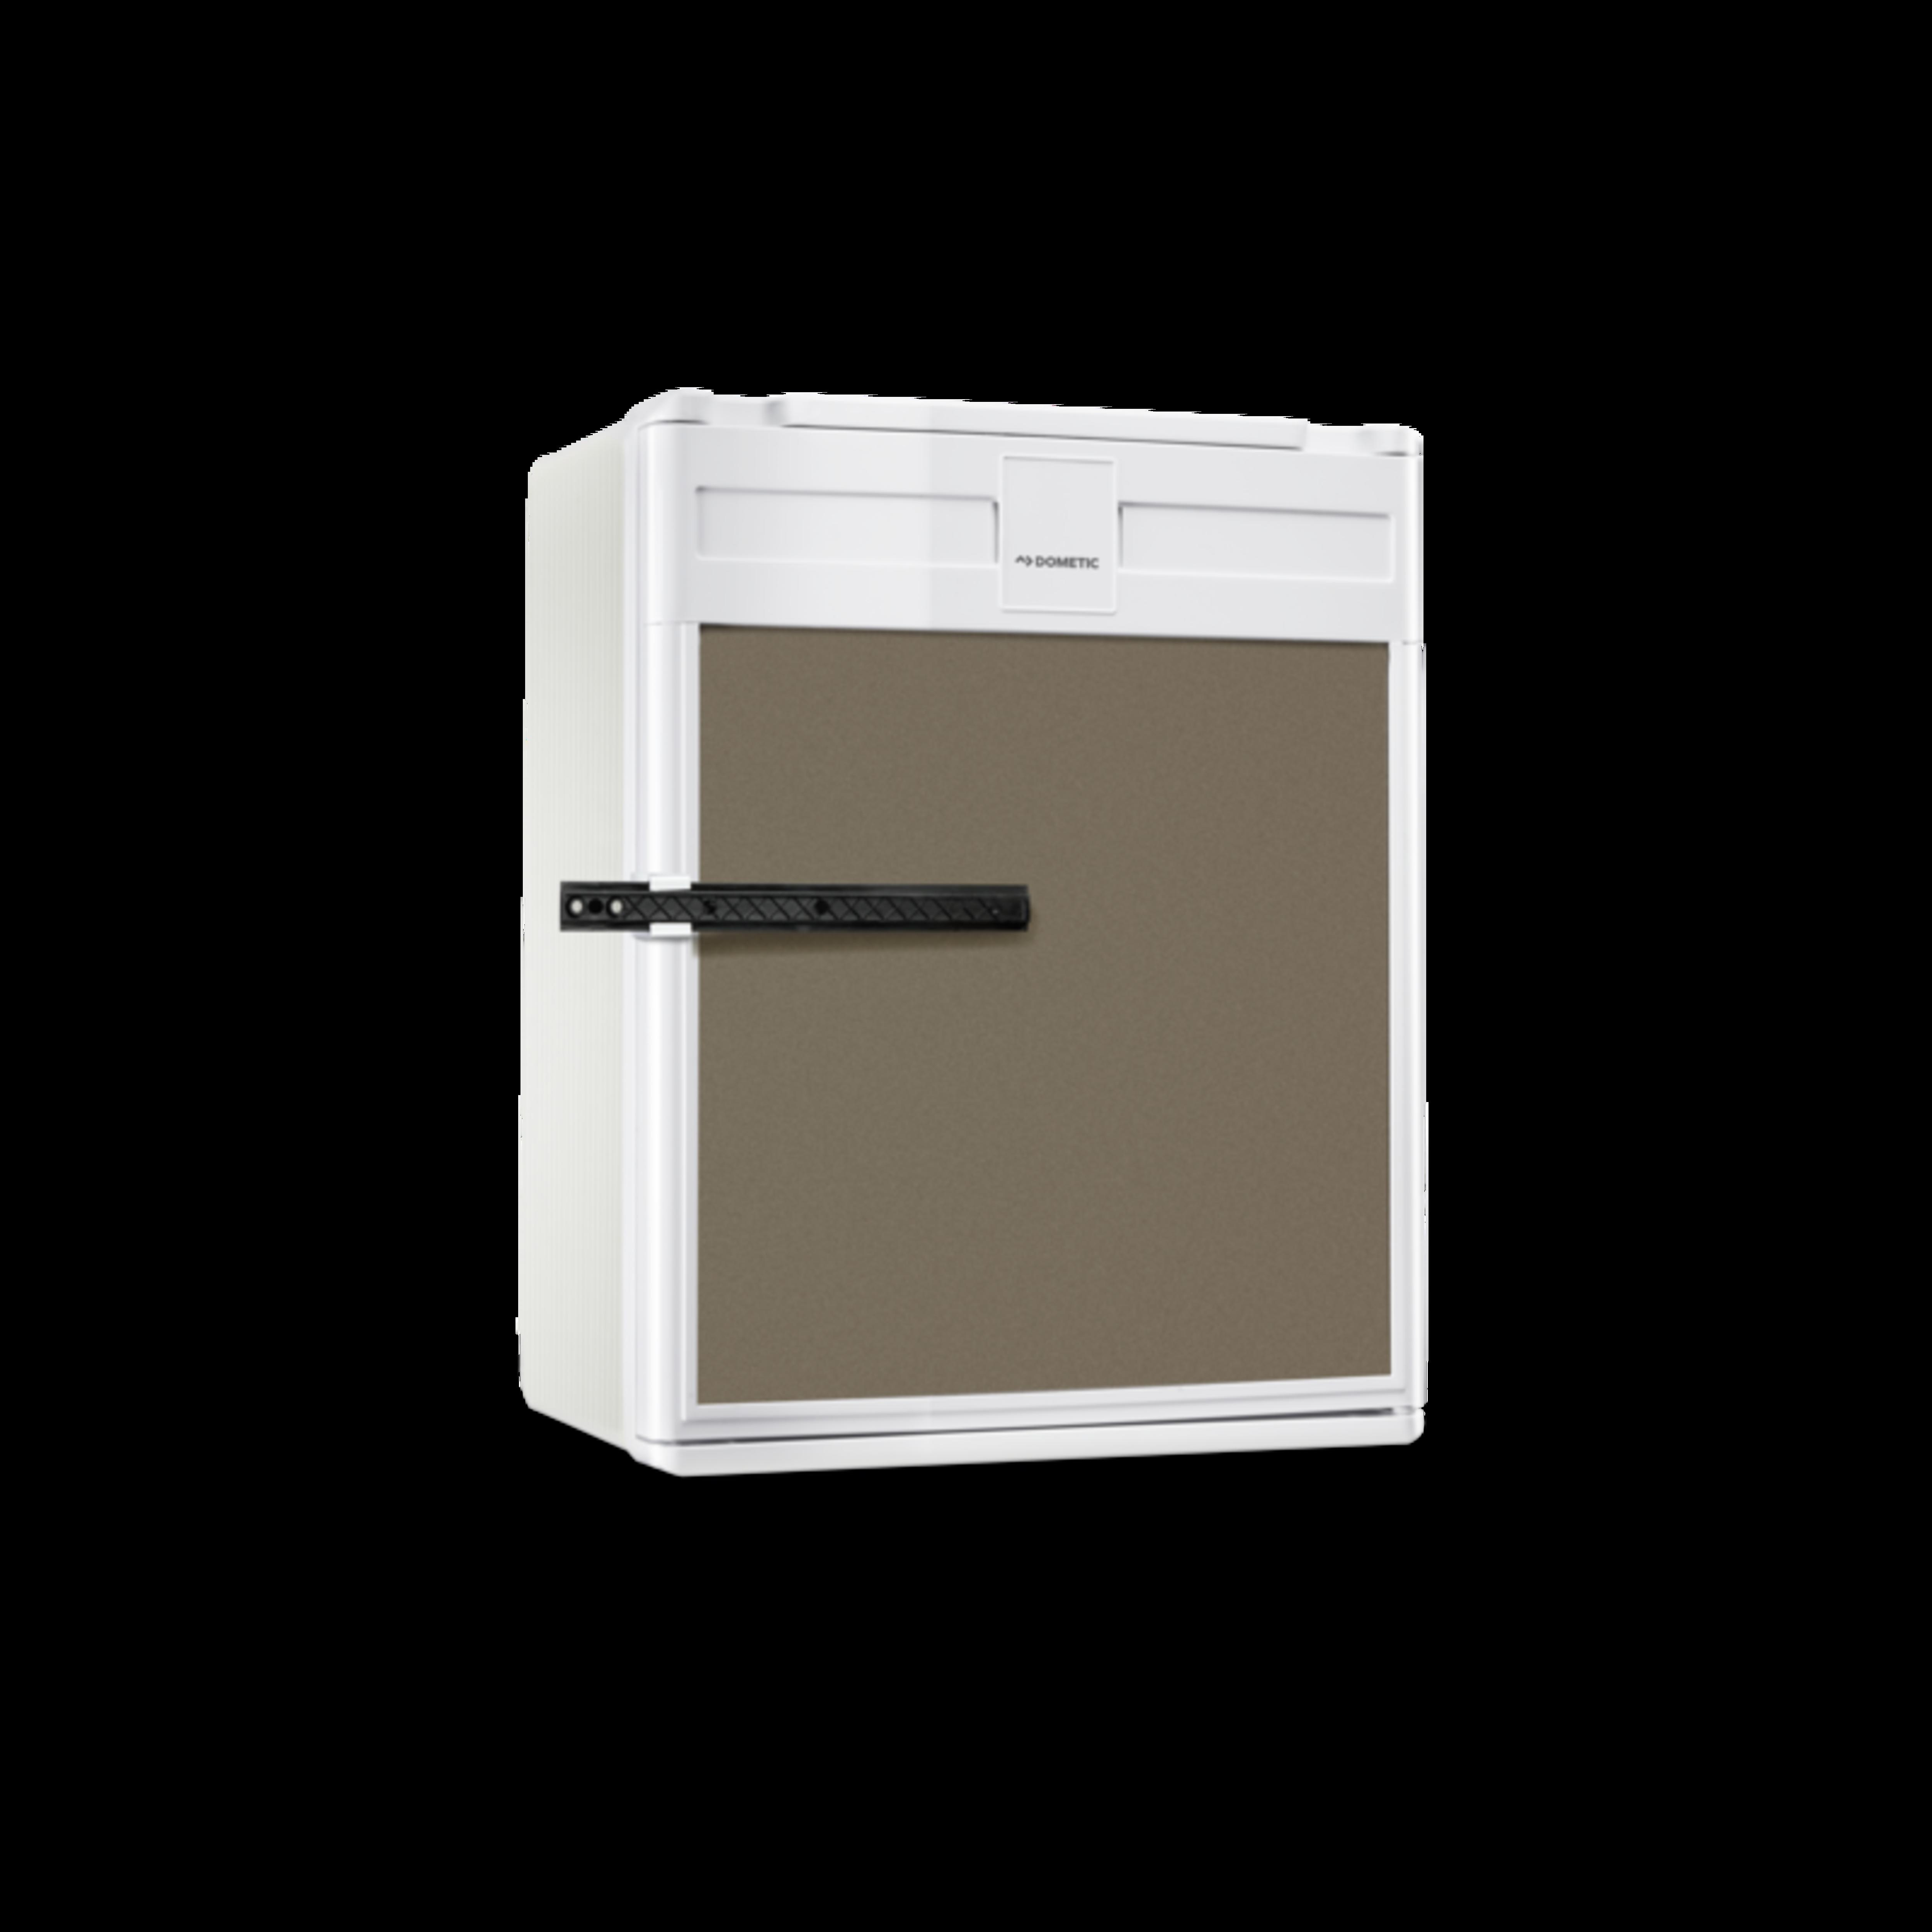 Dometic DS 300 BI